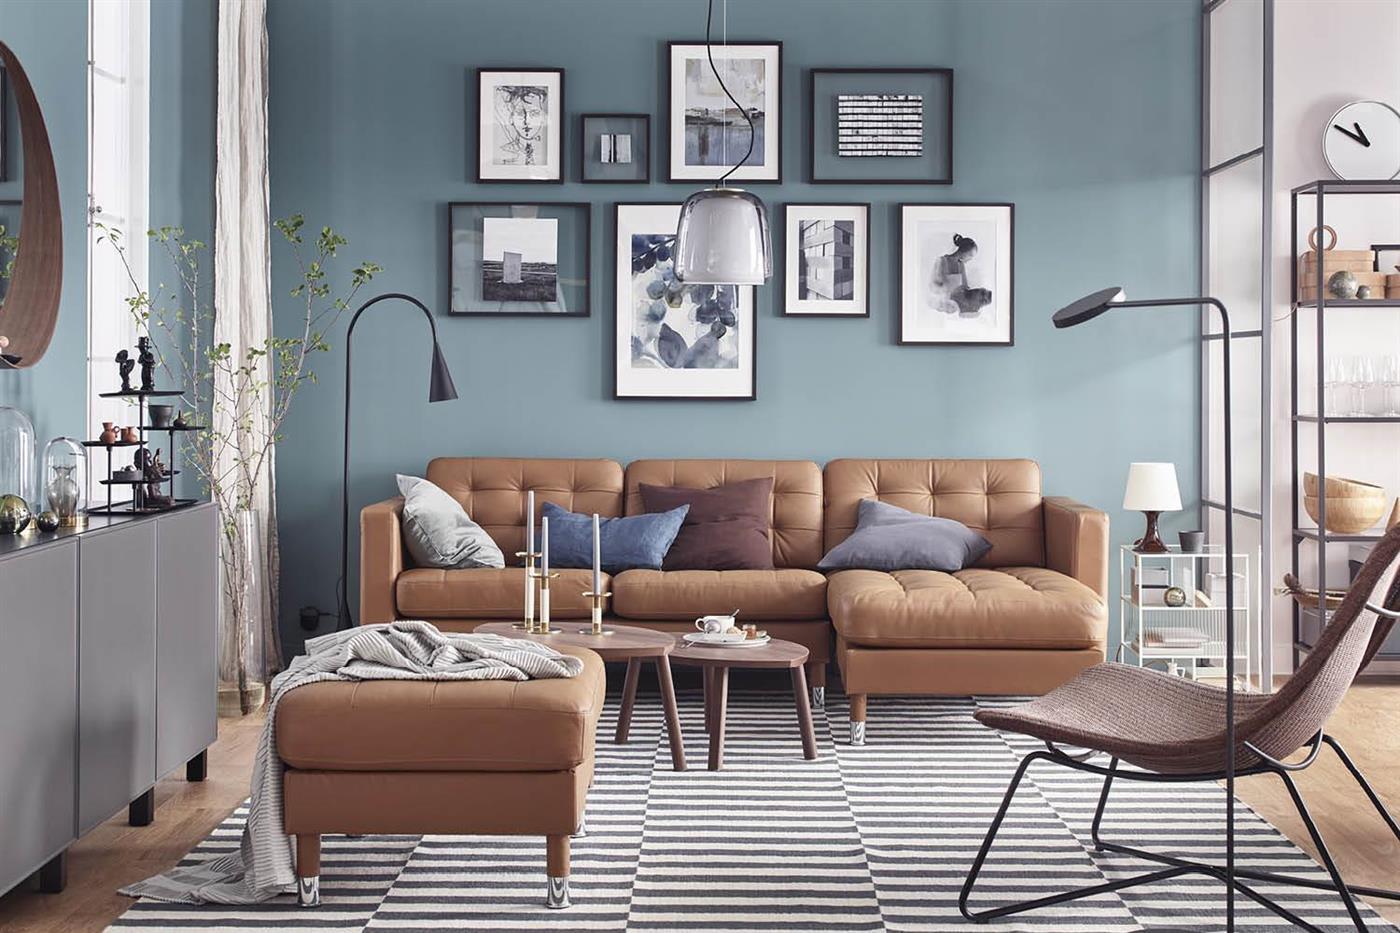 7 salones de ikea muy bonitos para renovar tu casa - Ideas salones ikea ...